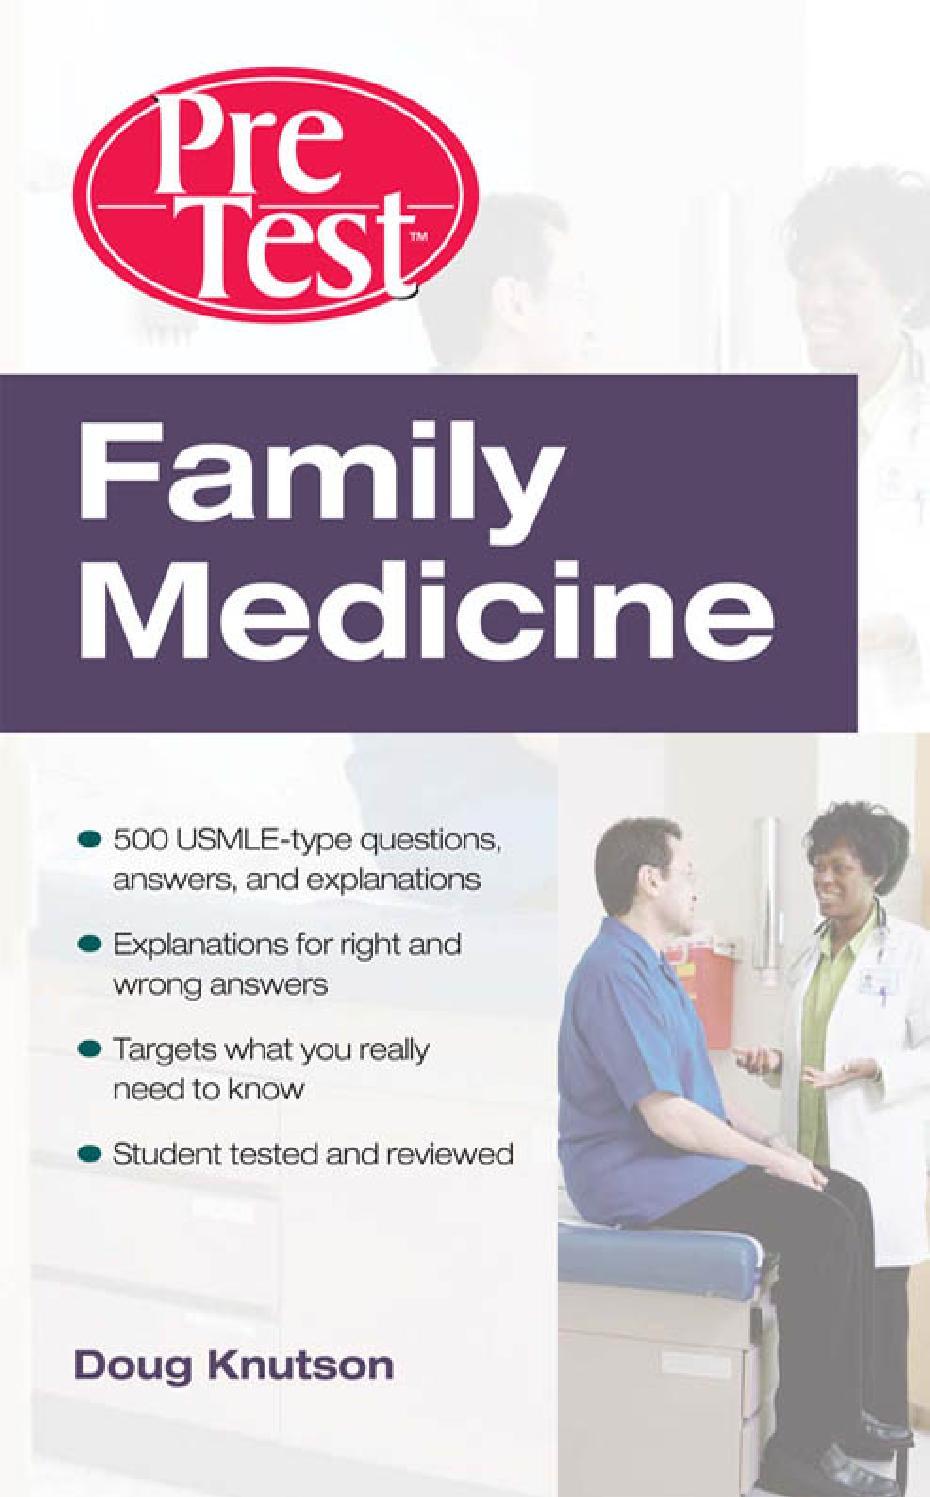 Pretest family medicine by EbooksforLife - issuu